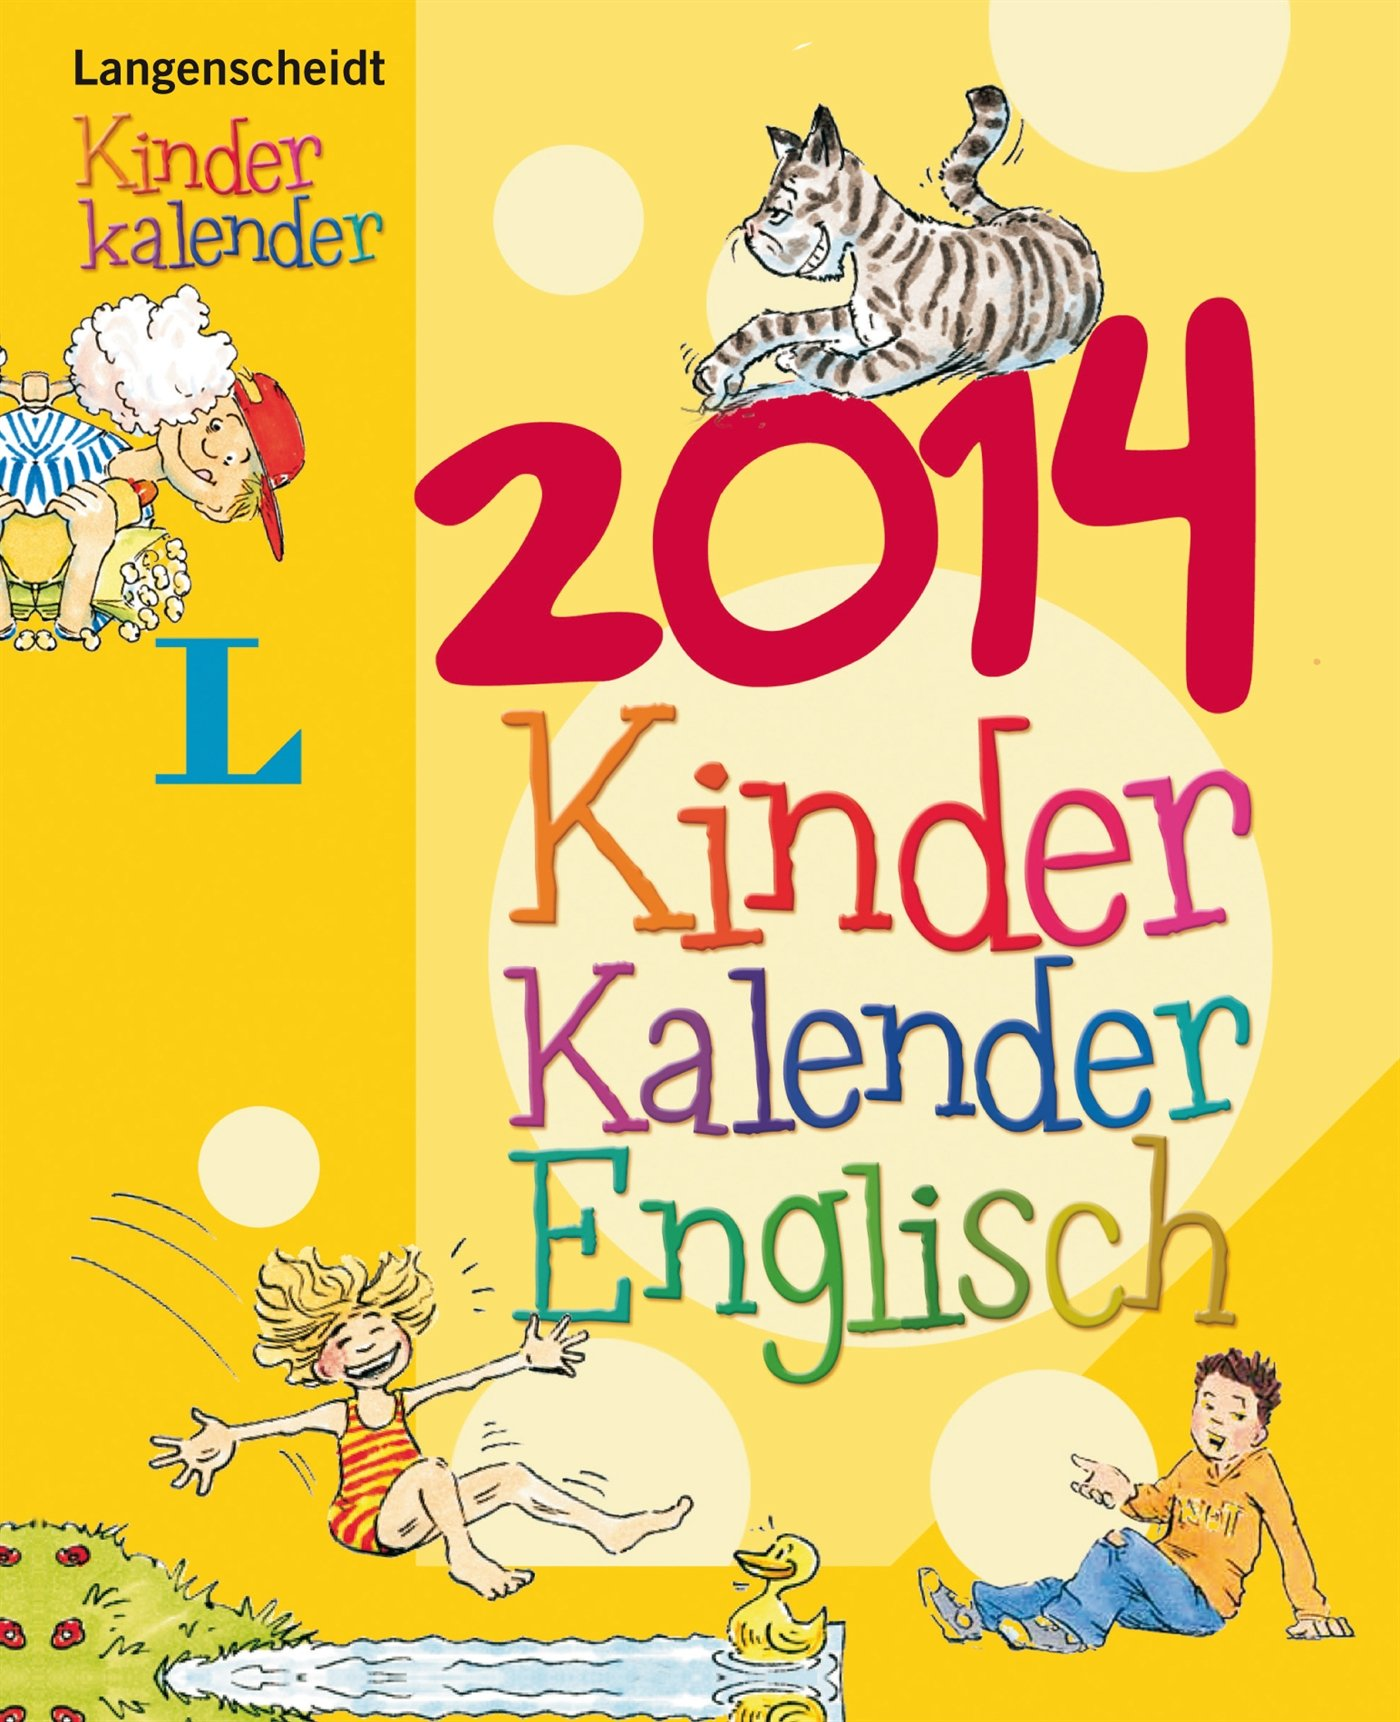 langenscheidt-kinderkalender-englisch-2014-kalender